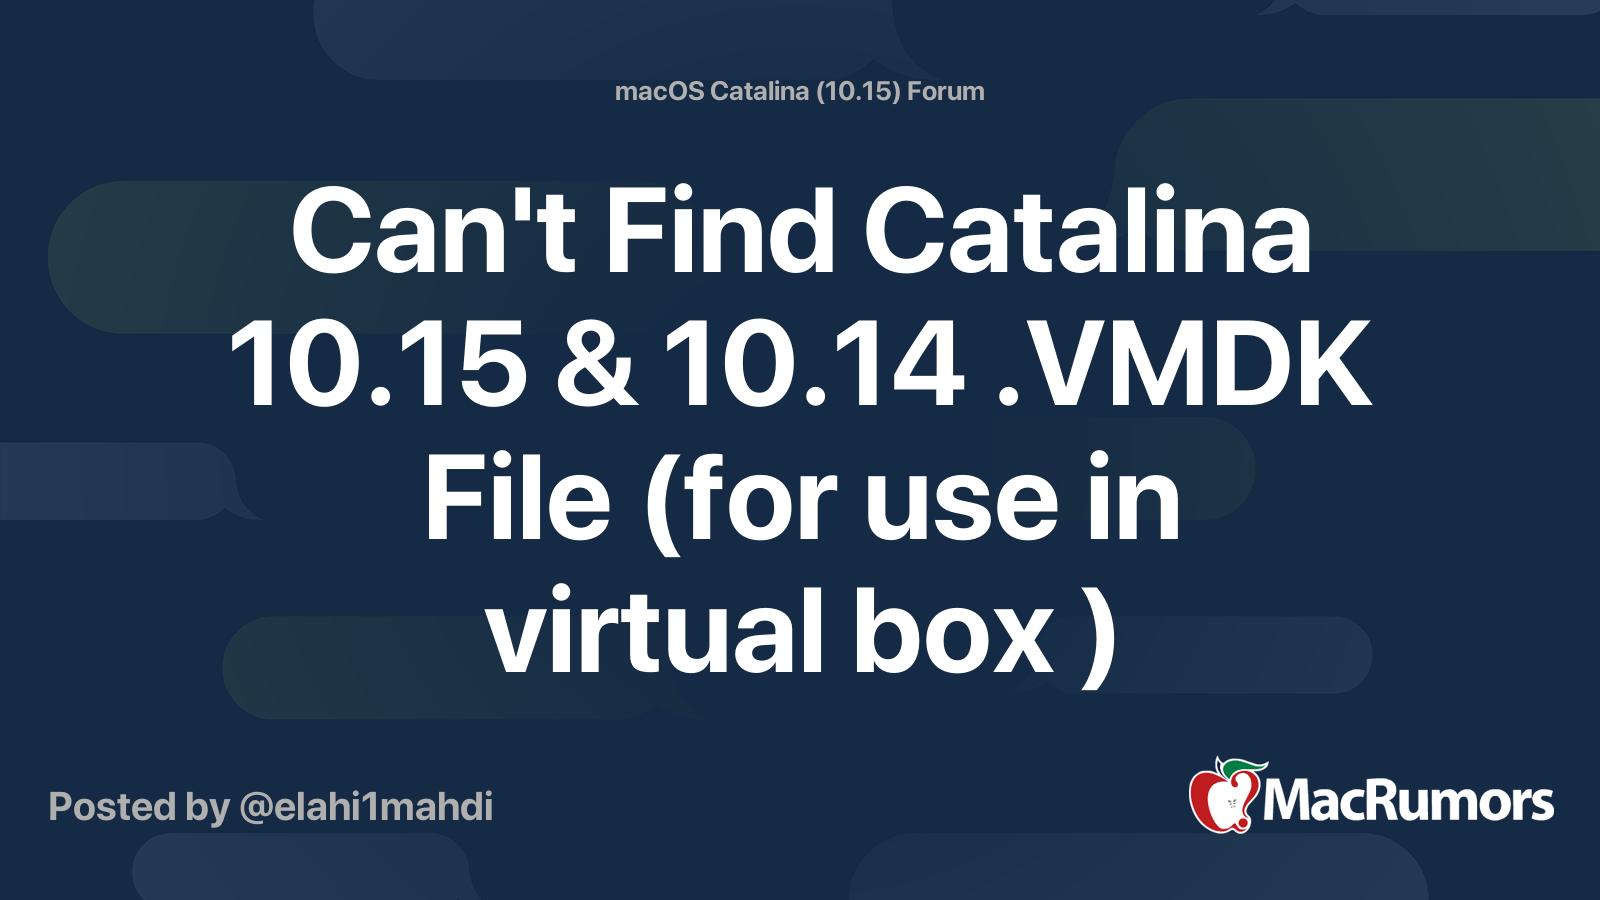 Mac Os Catalina Vmdk File Download